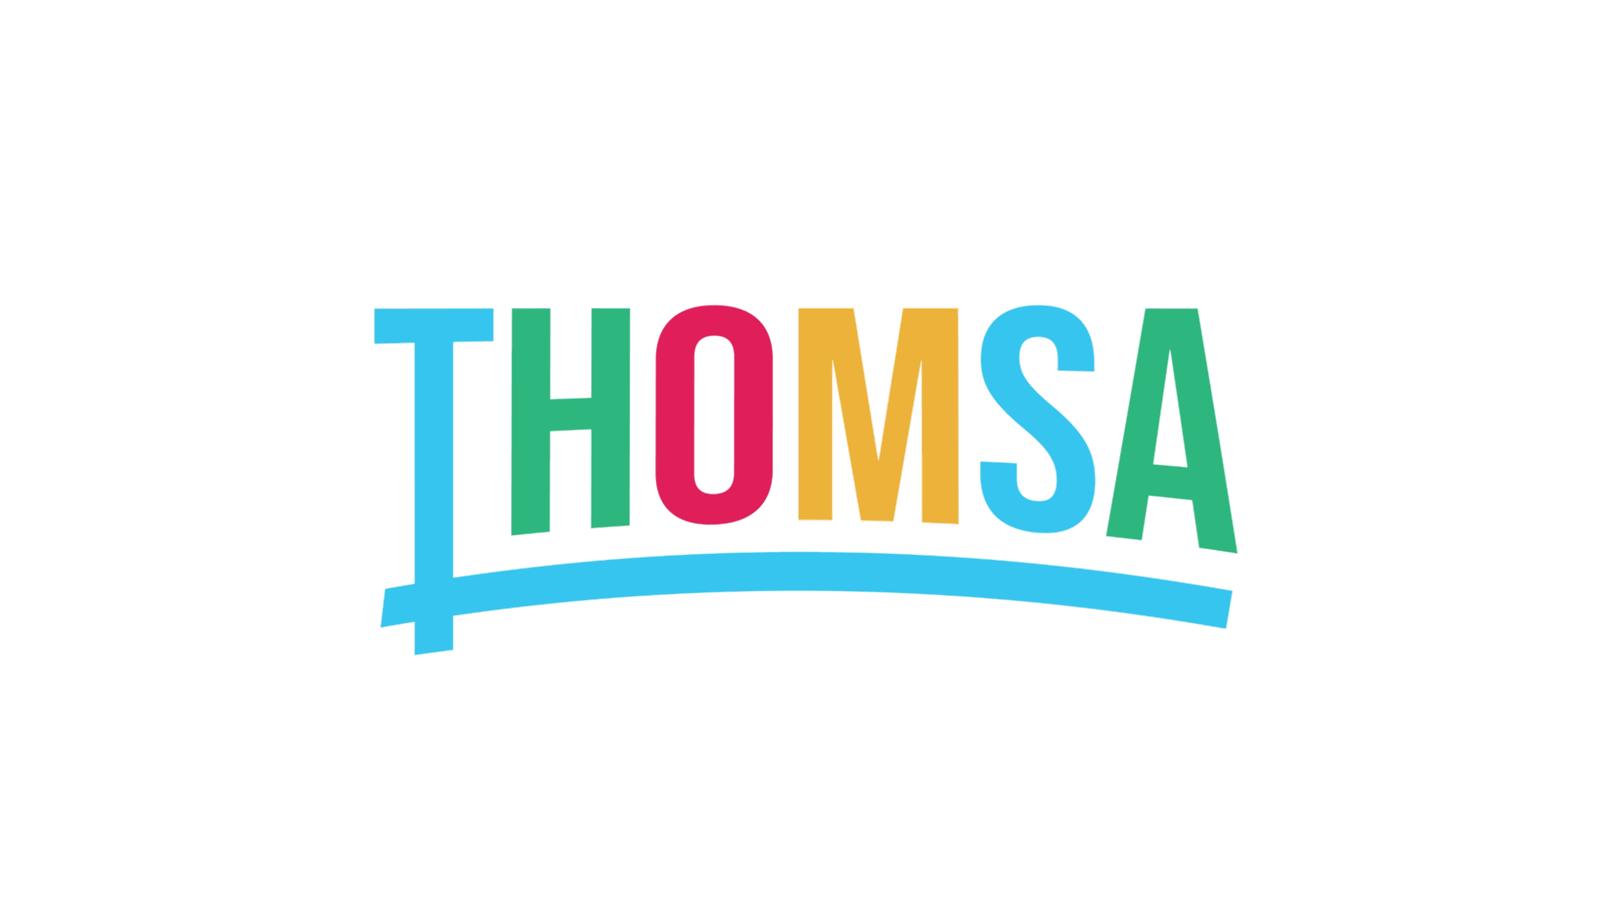 Thomsa